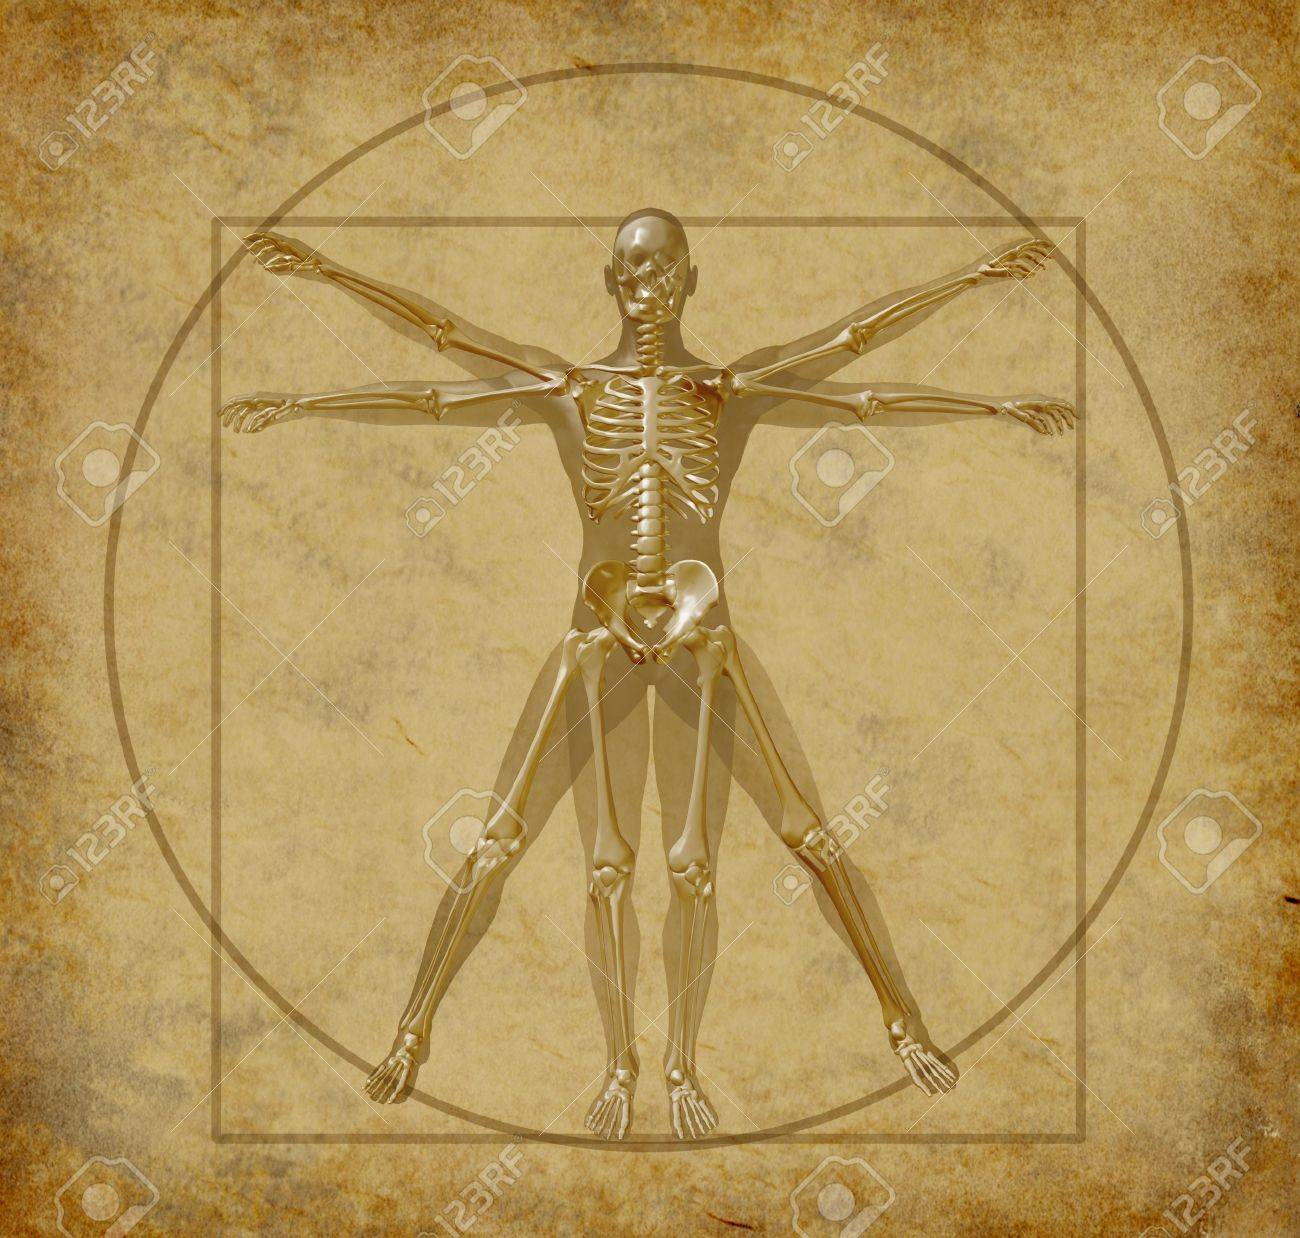 vitruvian human diagram grunge medical stock photo  picture and    stock photo   vitruvian human diagram grunge medical